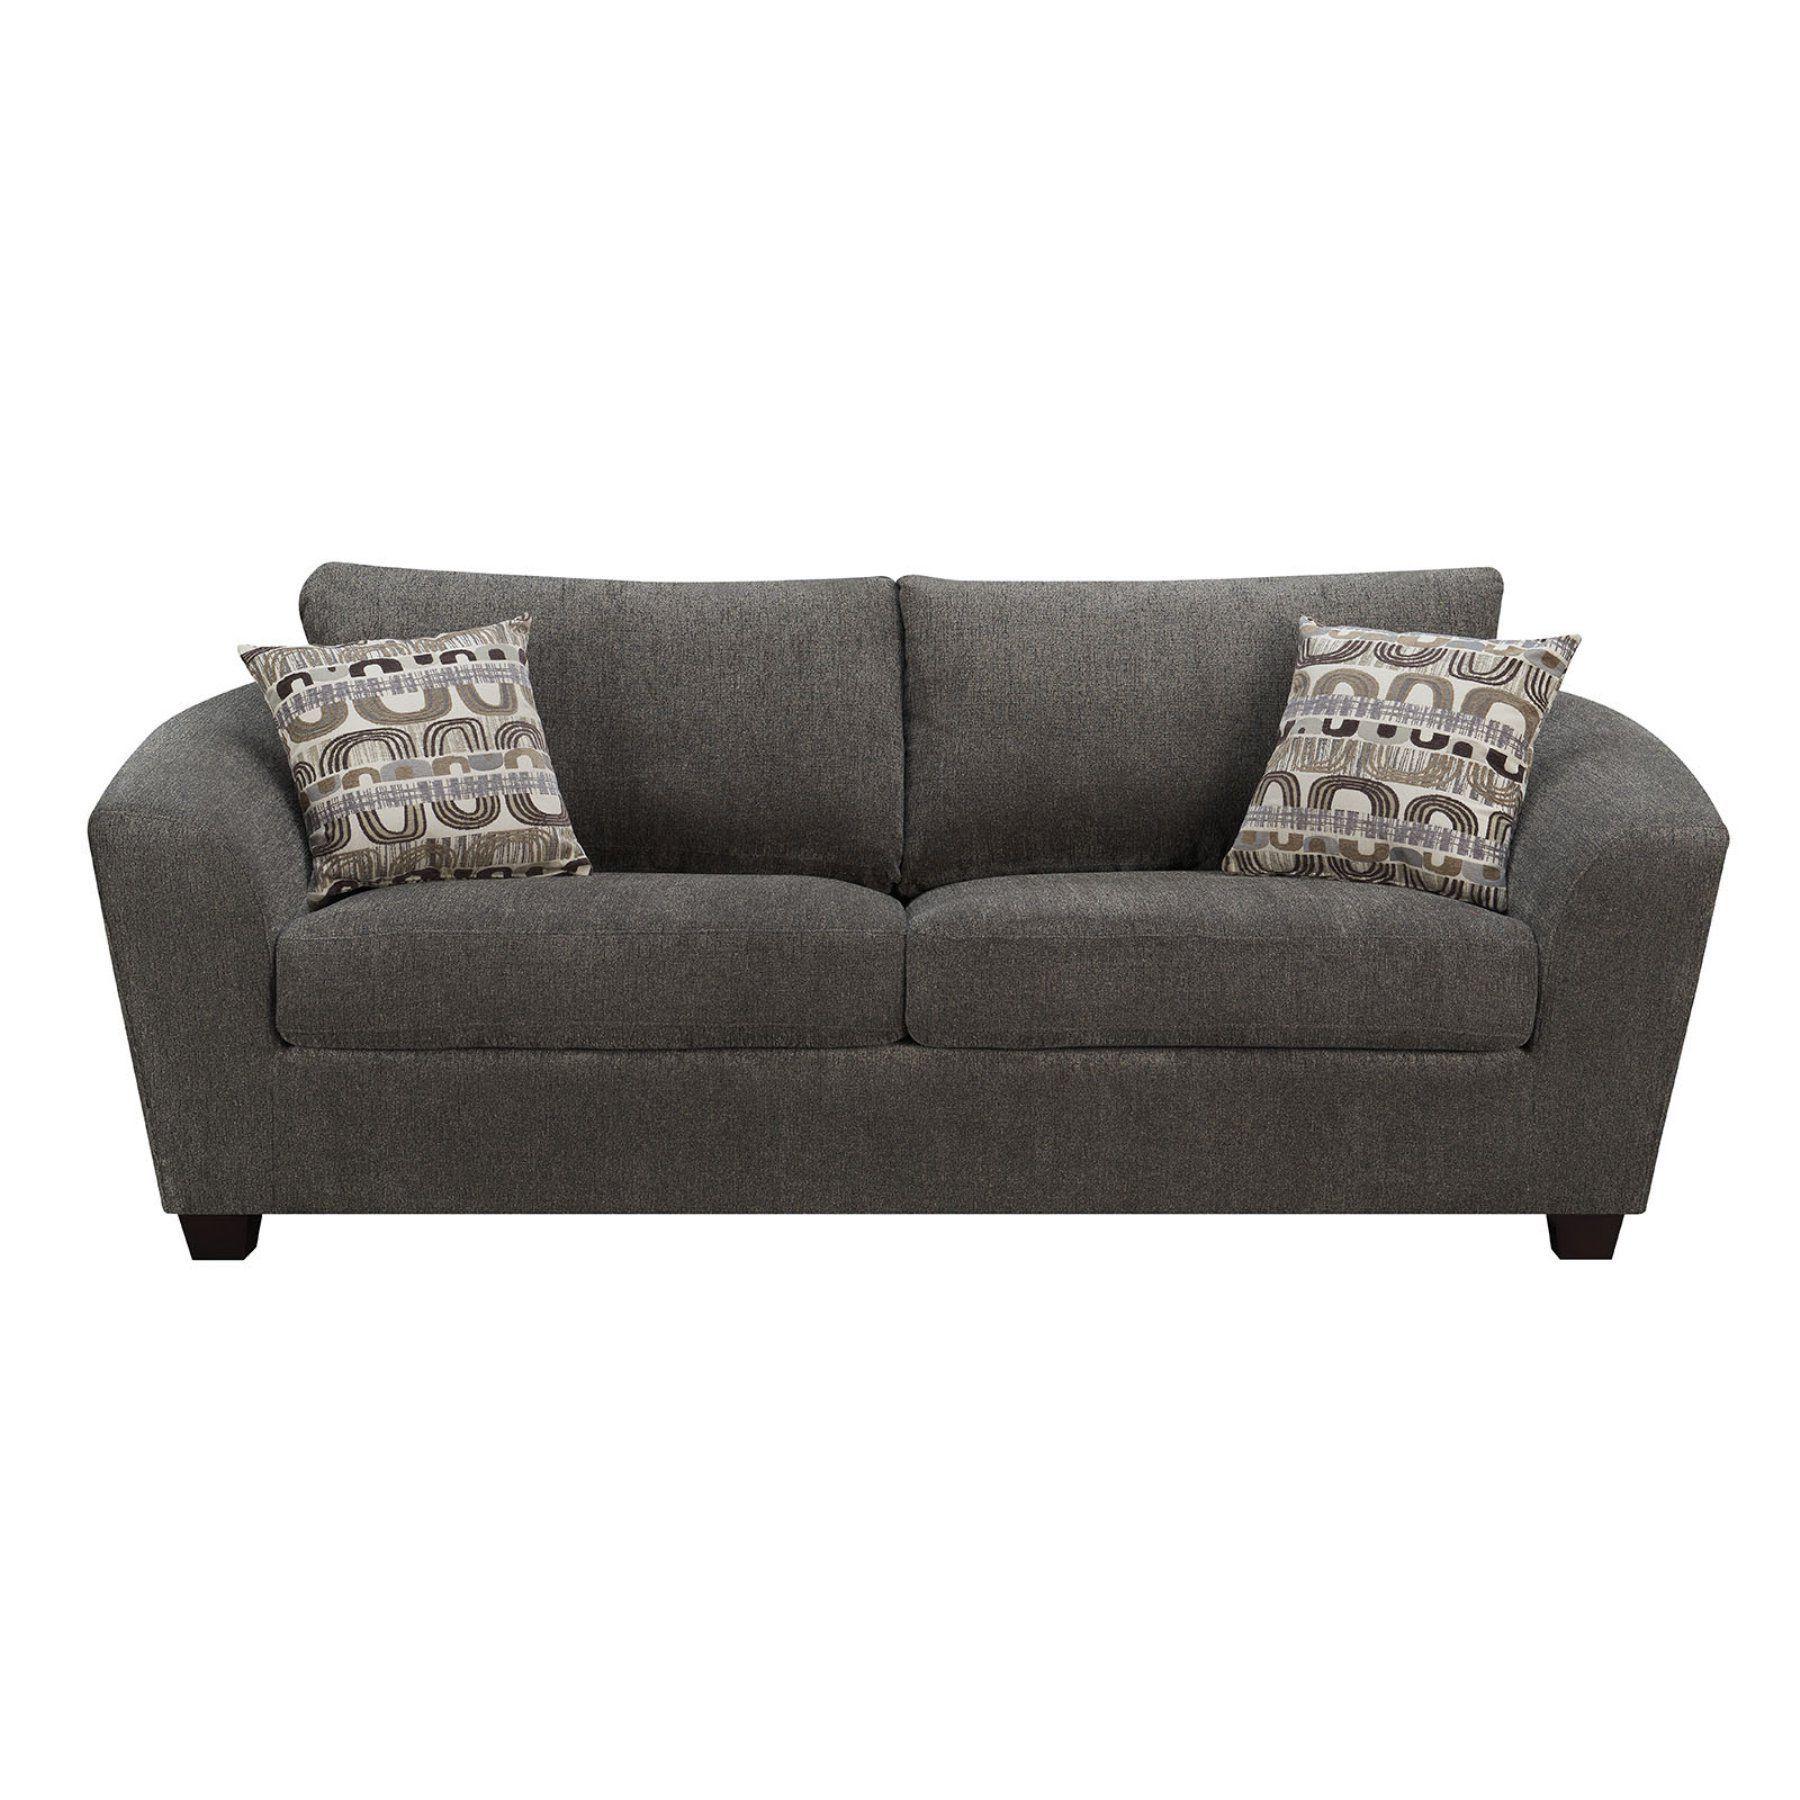 Emerald Home Urbana Sofa U3613m 00 13 Products Cushions On Sofa Sofa Sofa Upholstery